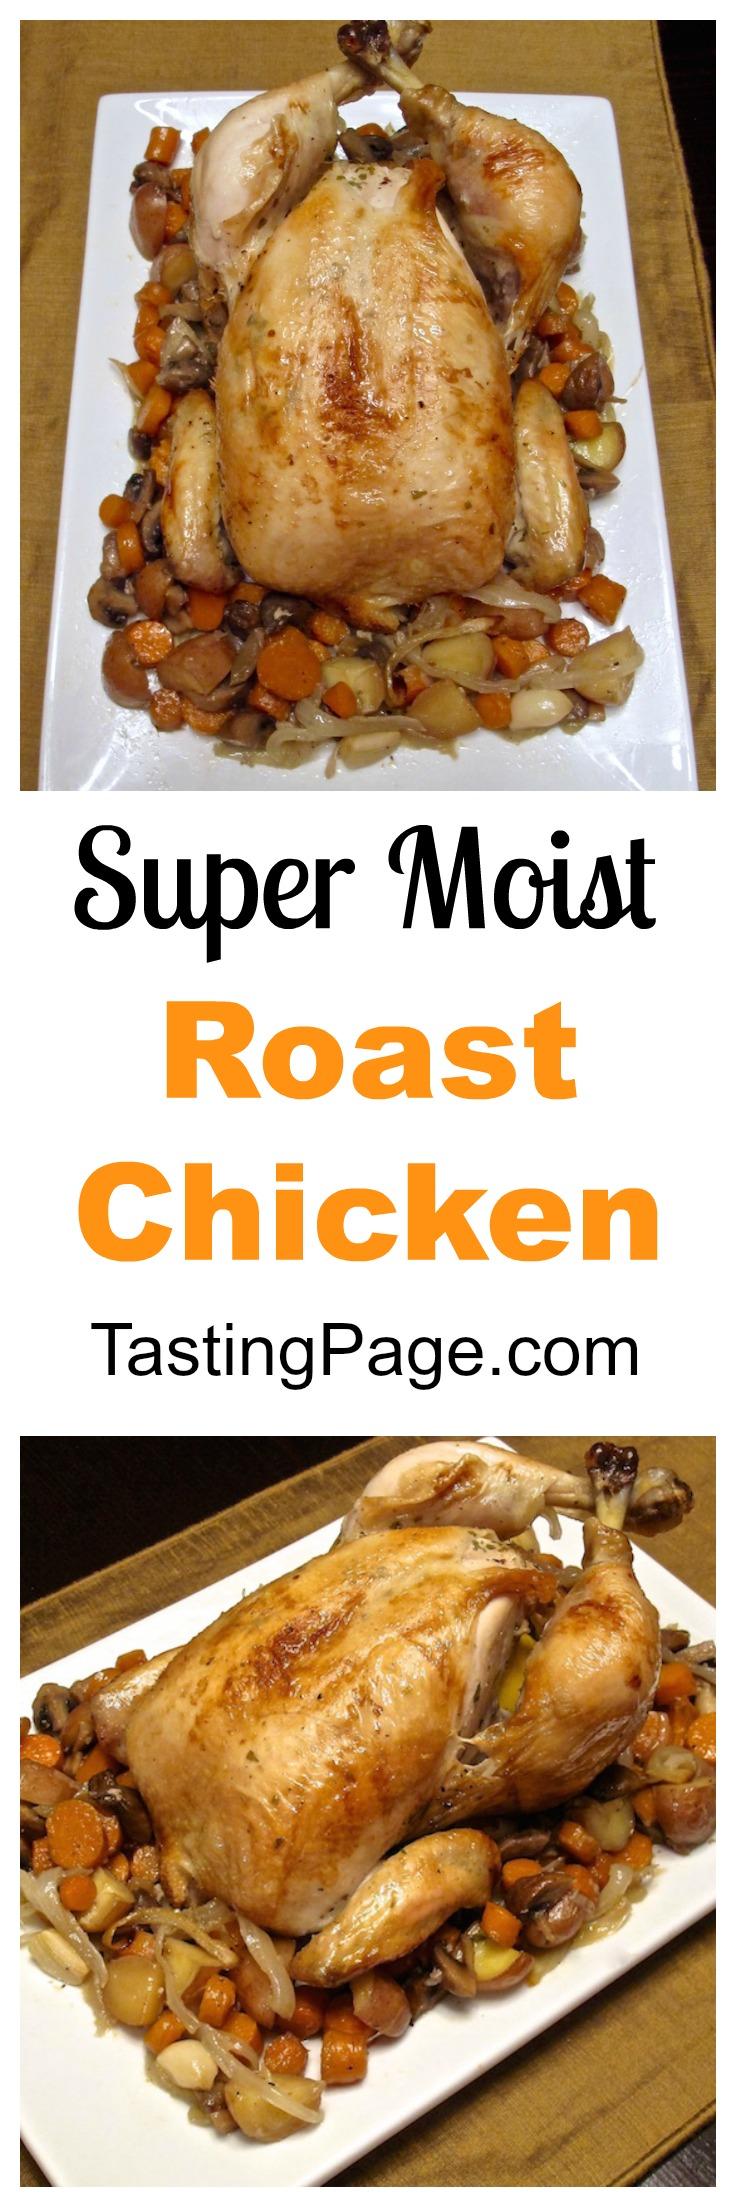 Super Moist Roast Chicken | TastingPage.com